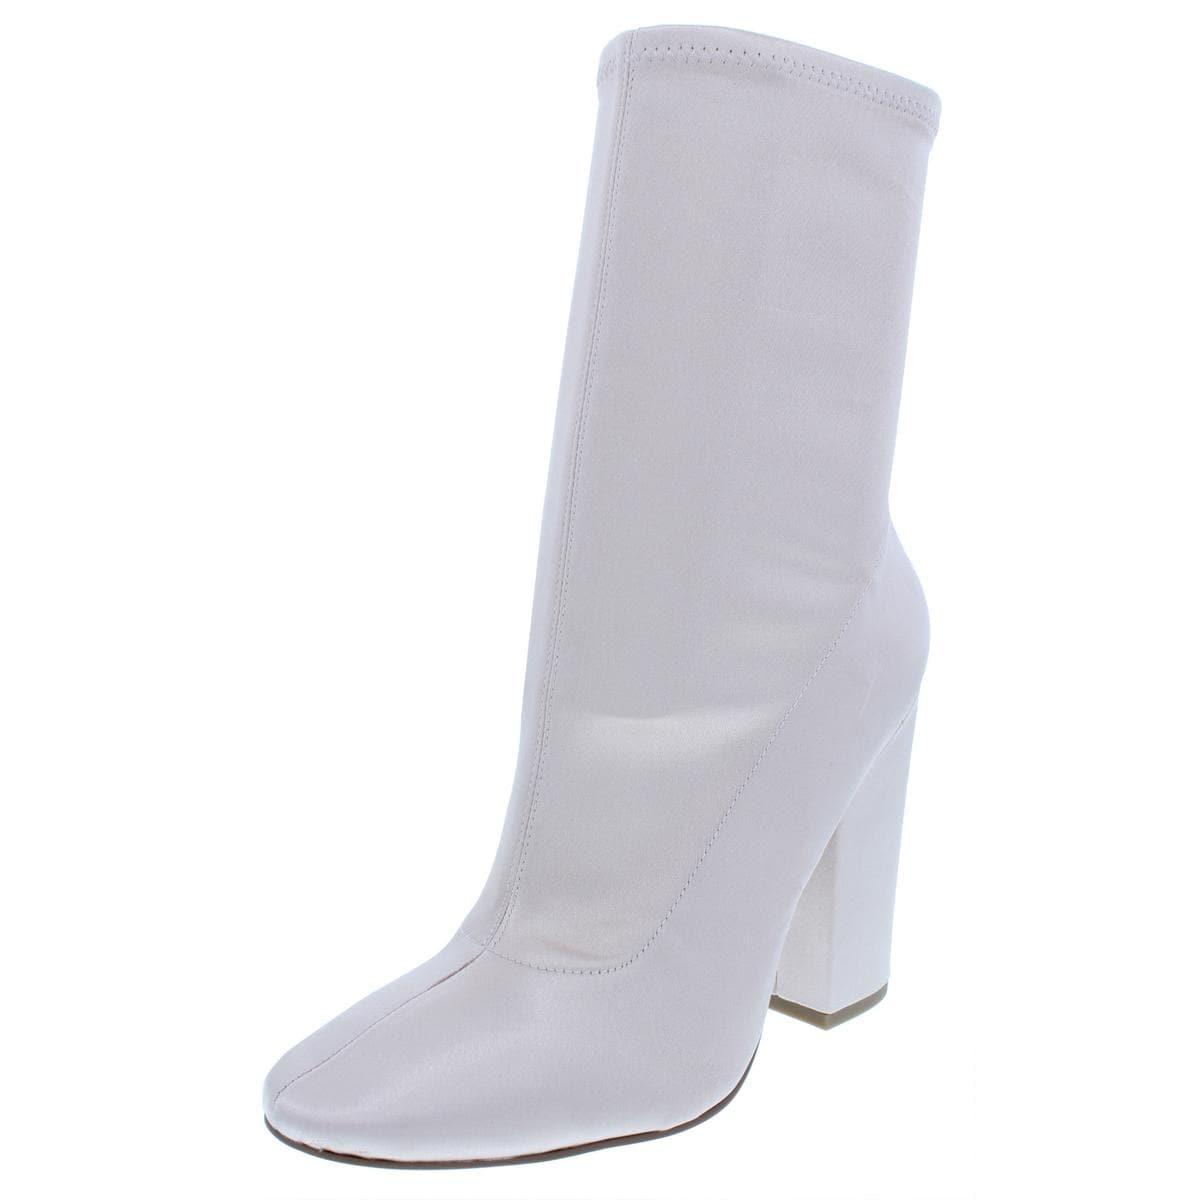 8033d04628de0 Shop Kendall + Kylie Womens Hailey Mid-Calf Boots Satin Block Heel - Free  Shipping Today - Overstock - 23562742